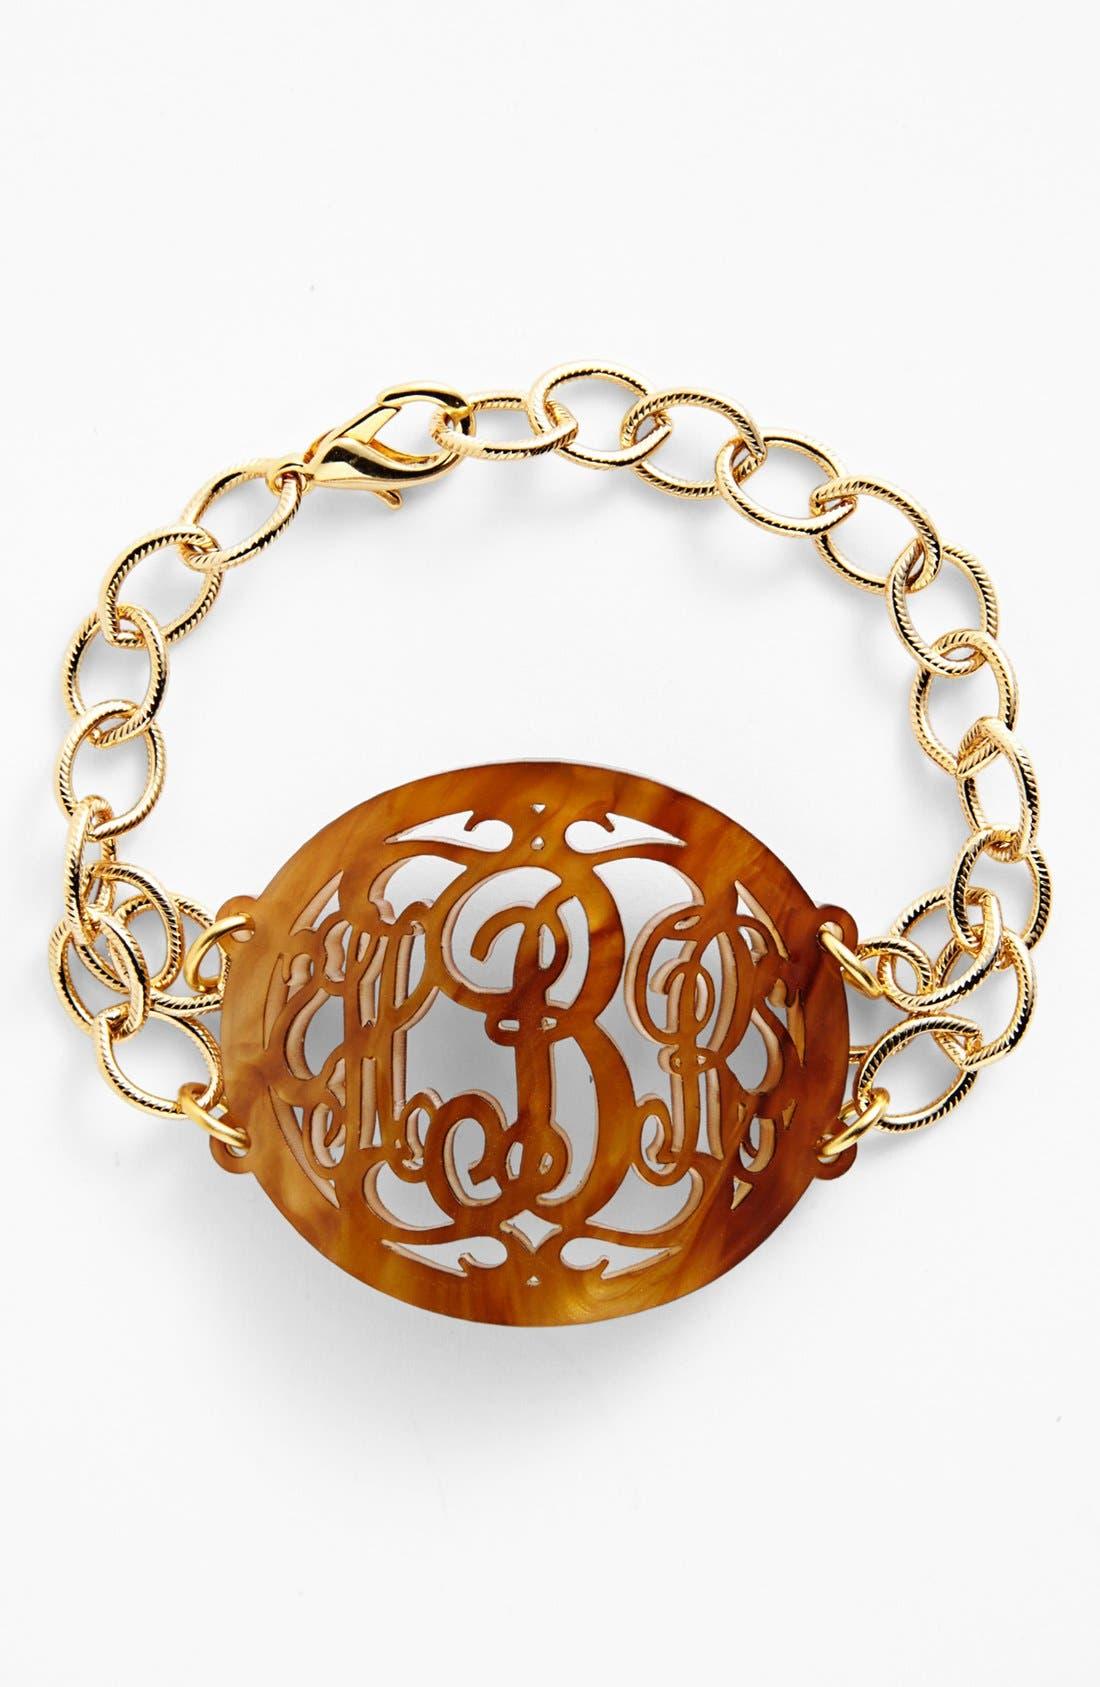 'Annabel' Large Oval Personalized Monogram Bracelet,                         Main,                         color, TIGERS EYE/ GOLD